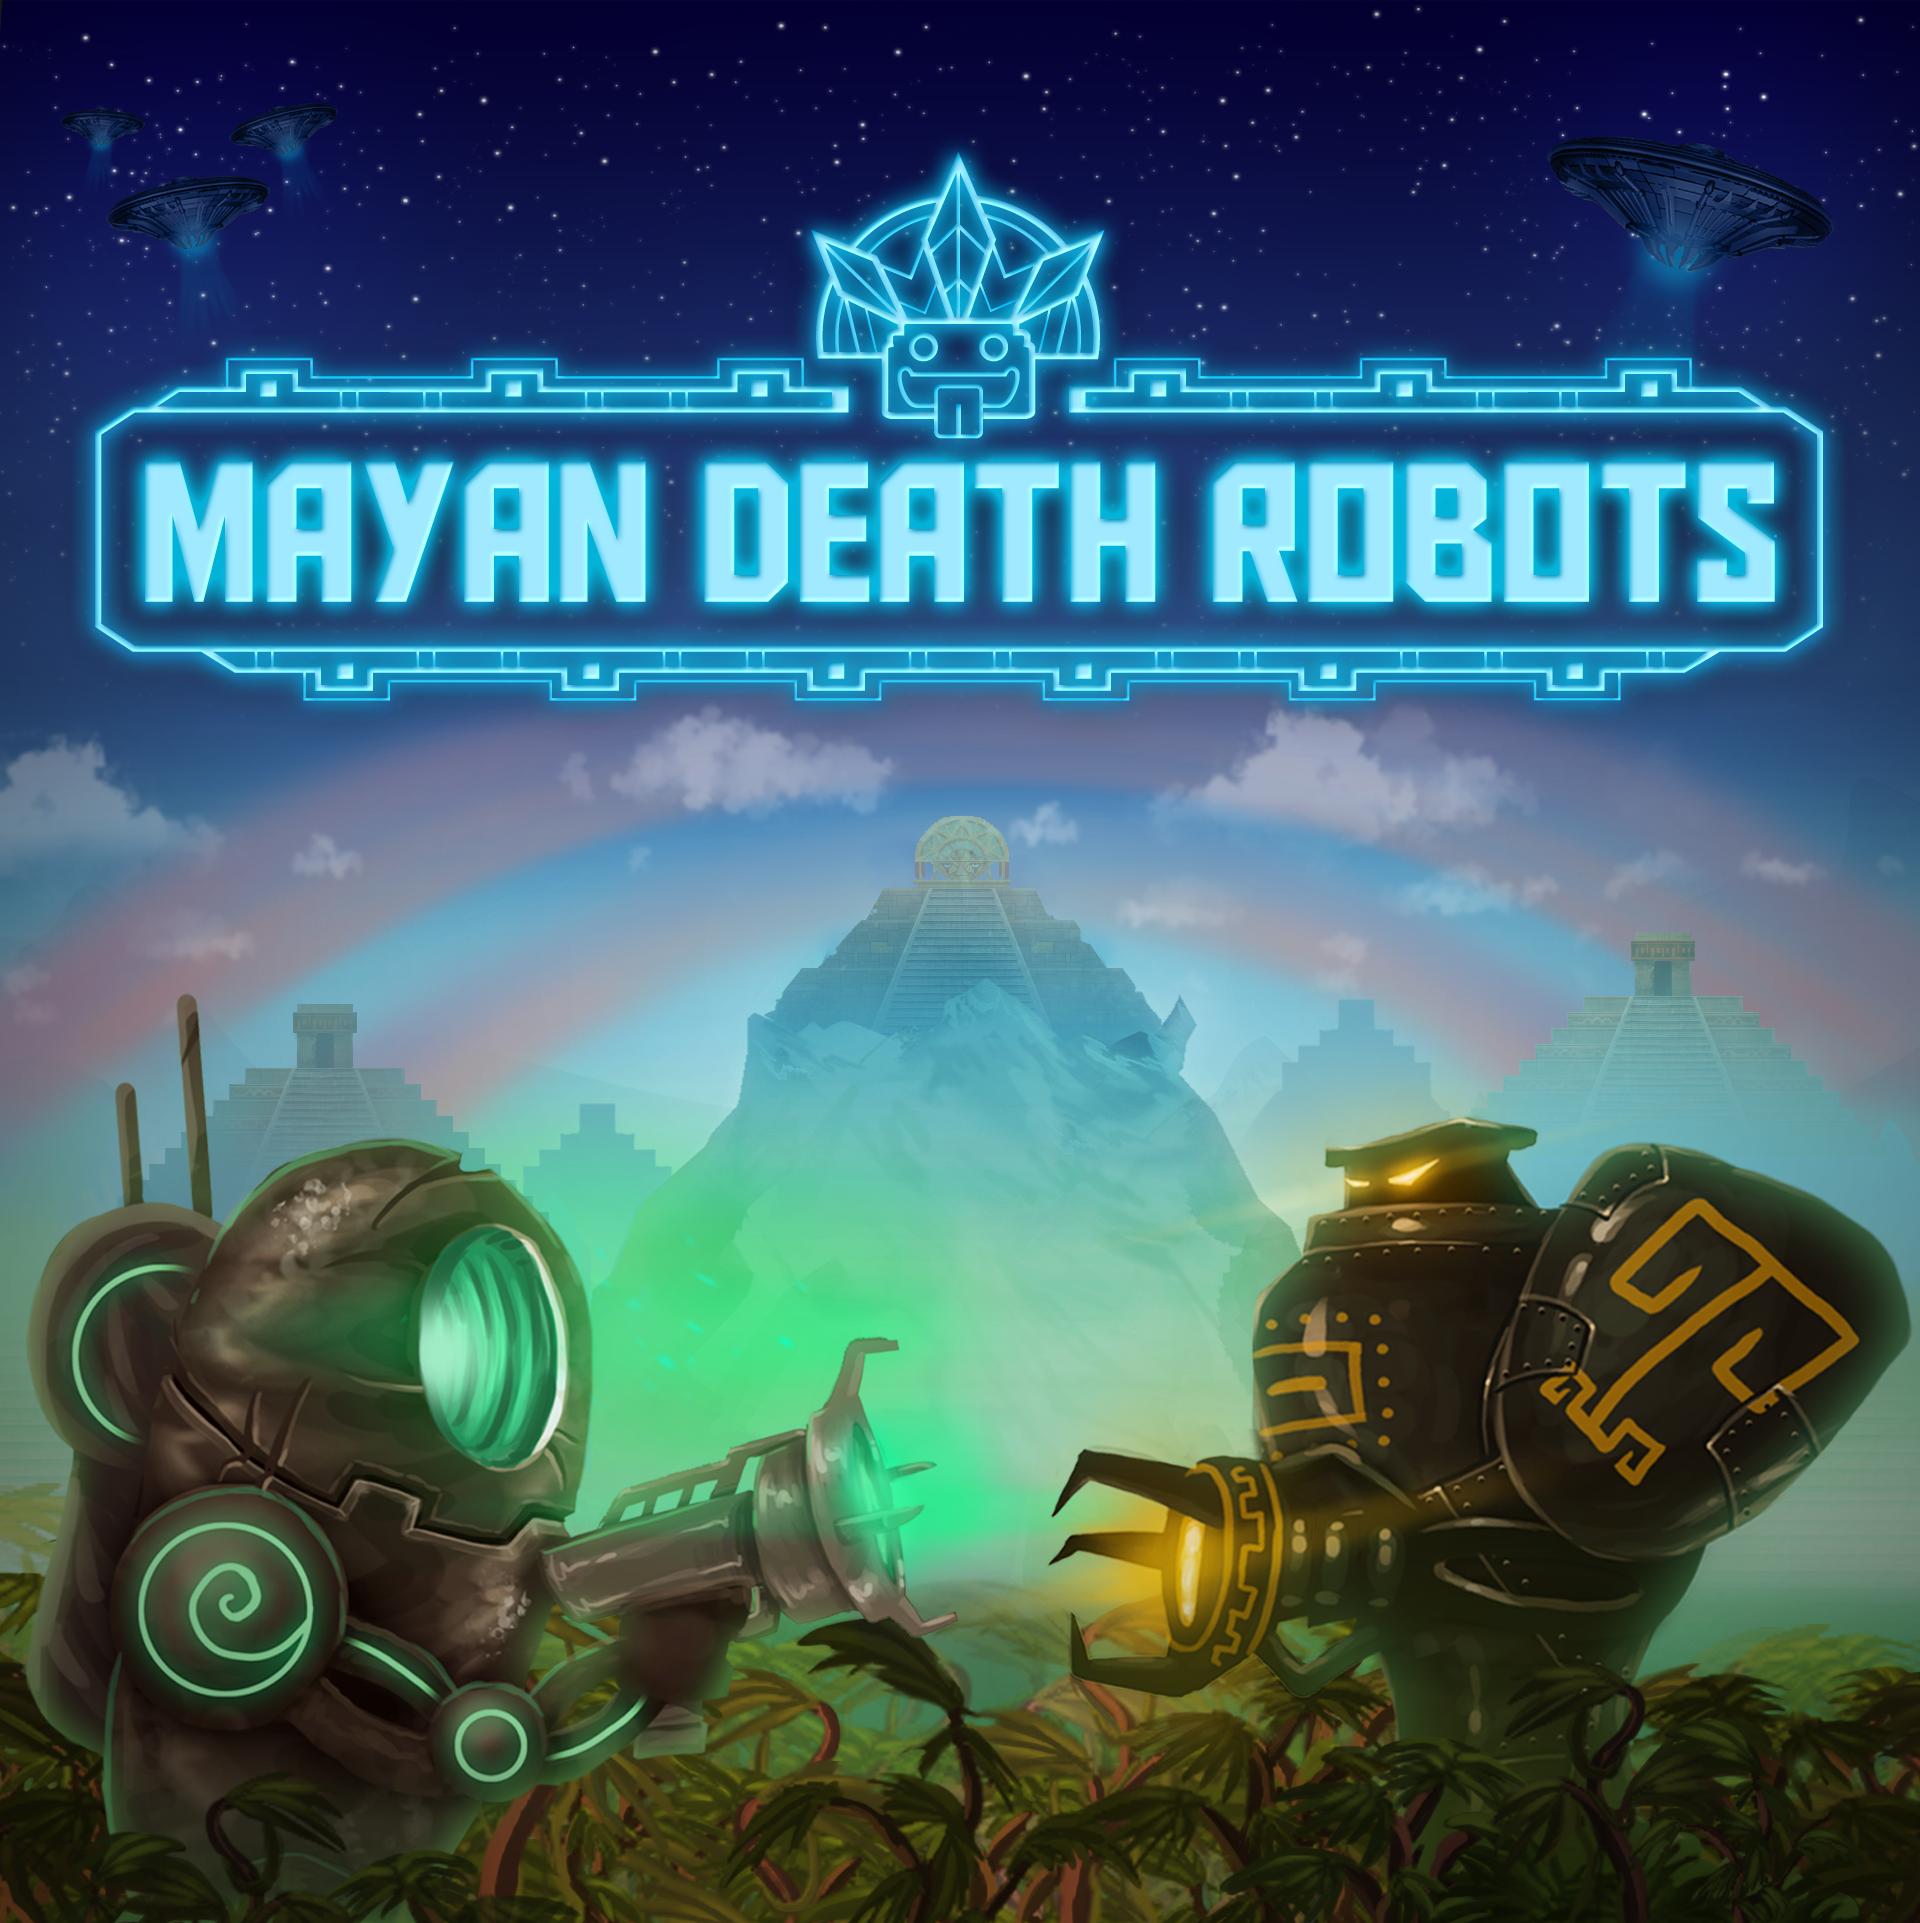 Mayan Death Robots